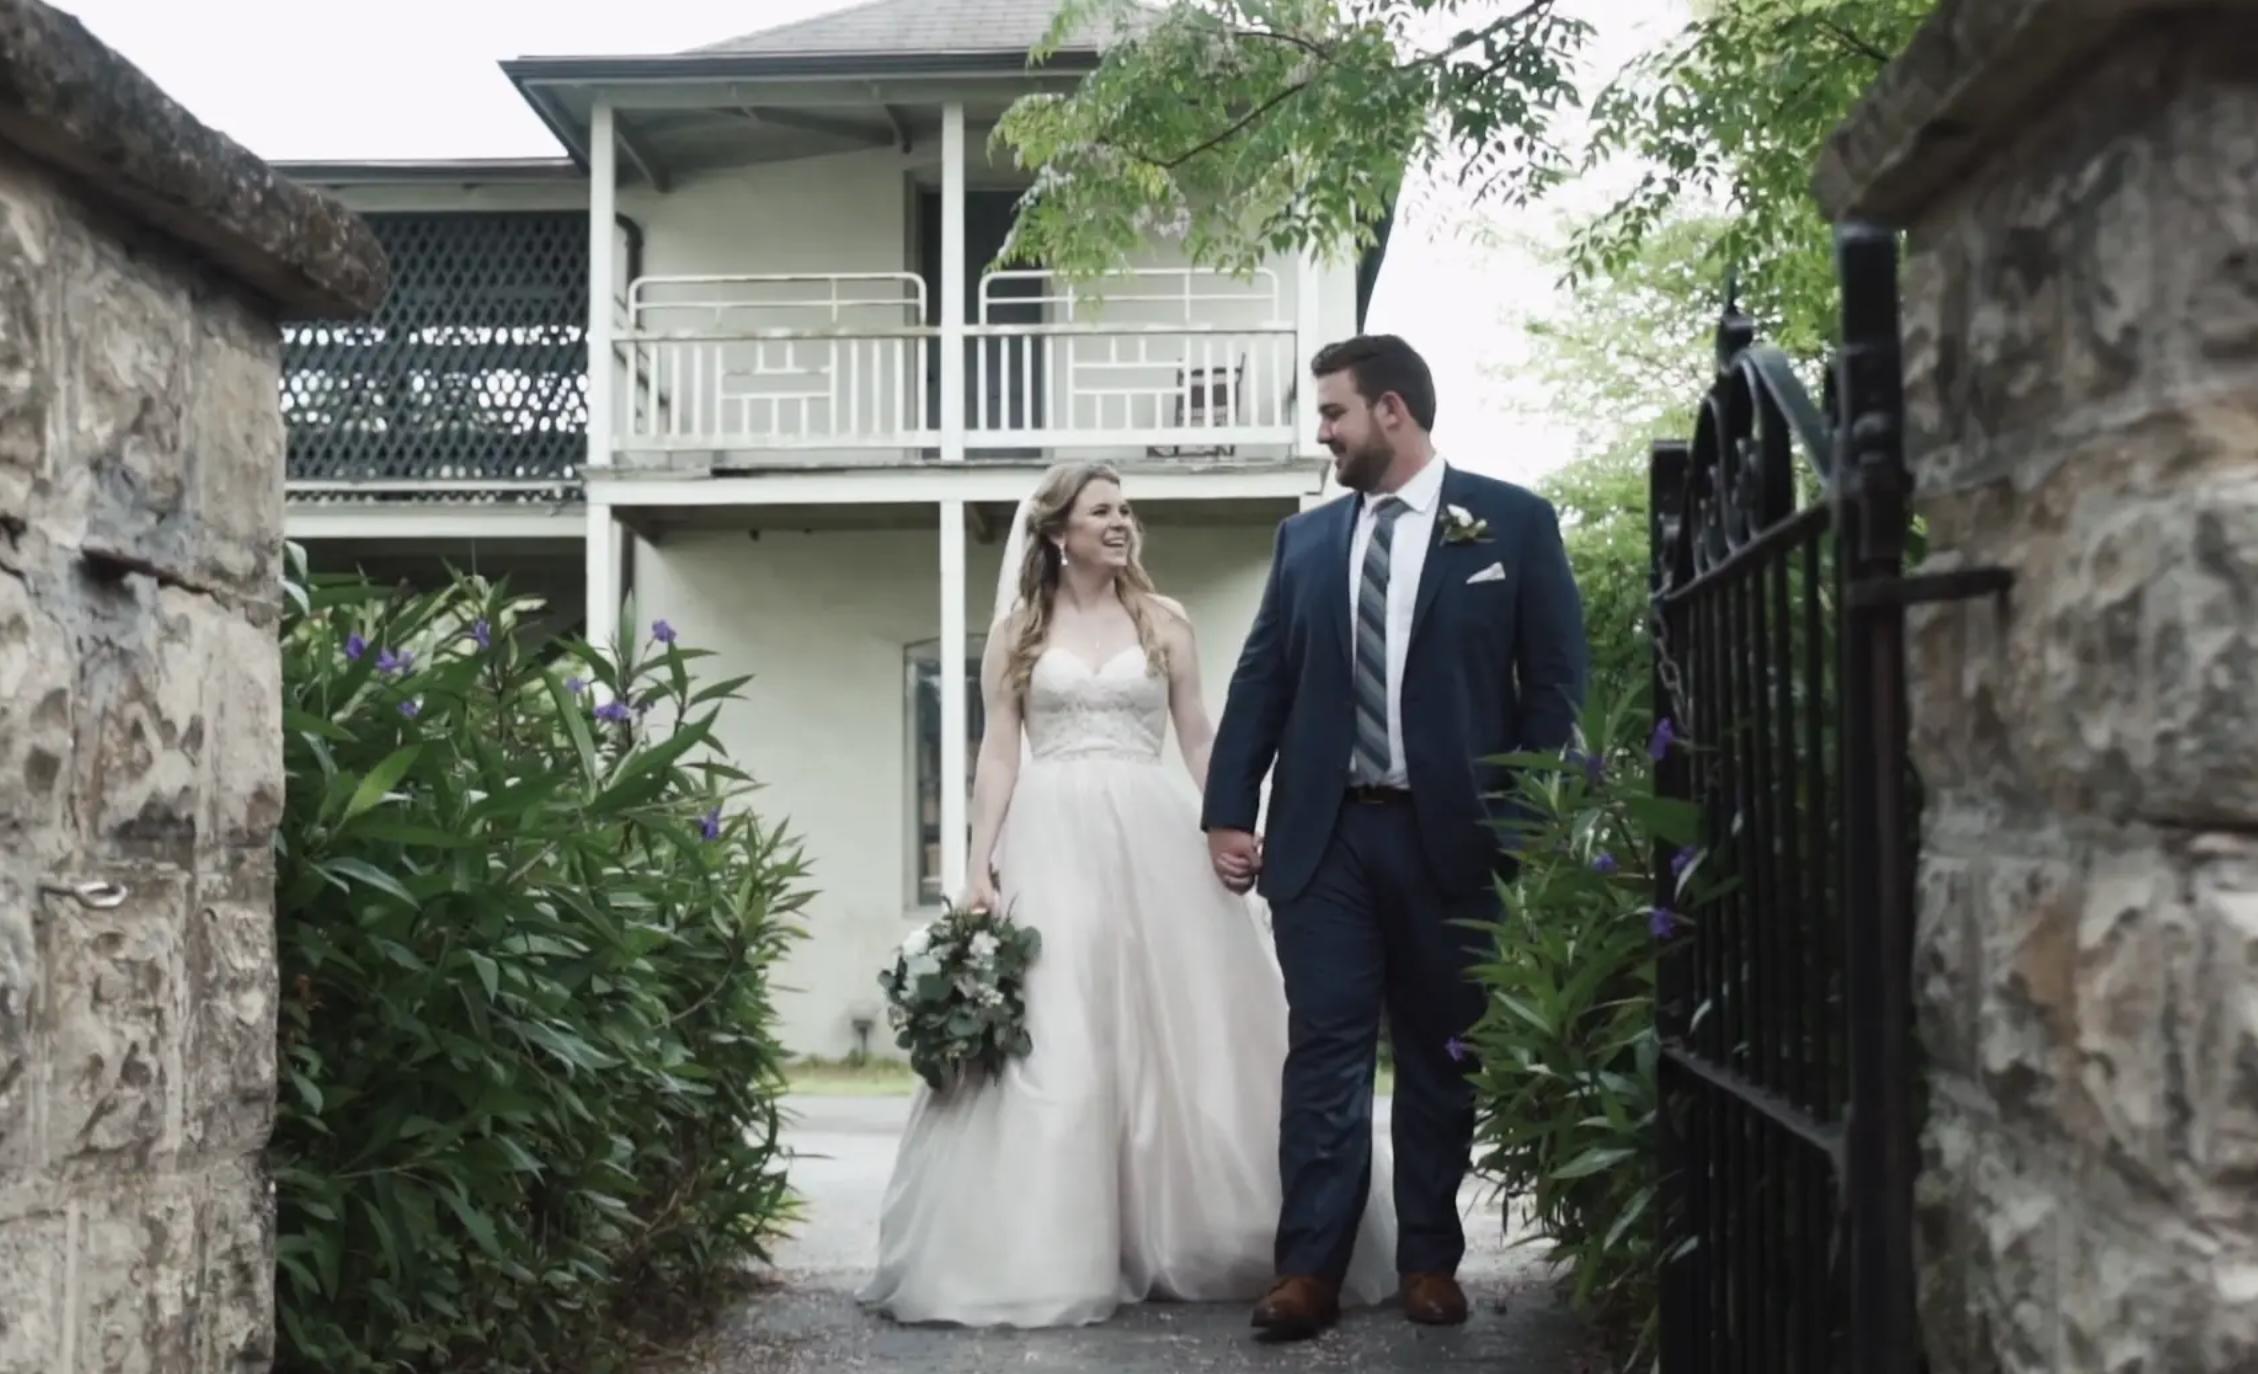 Erica + Thomas | St. Augustine, Florida | The White Room